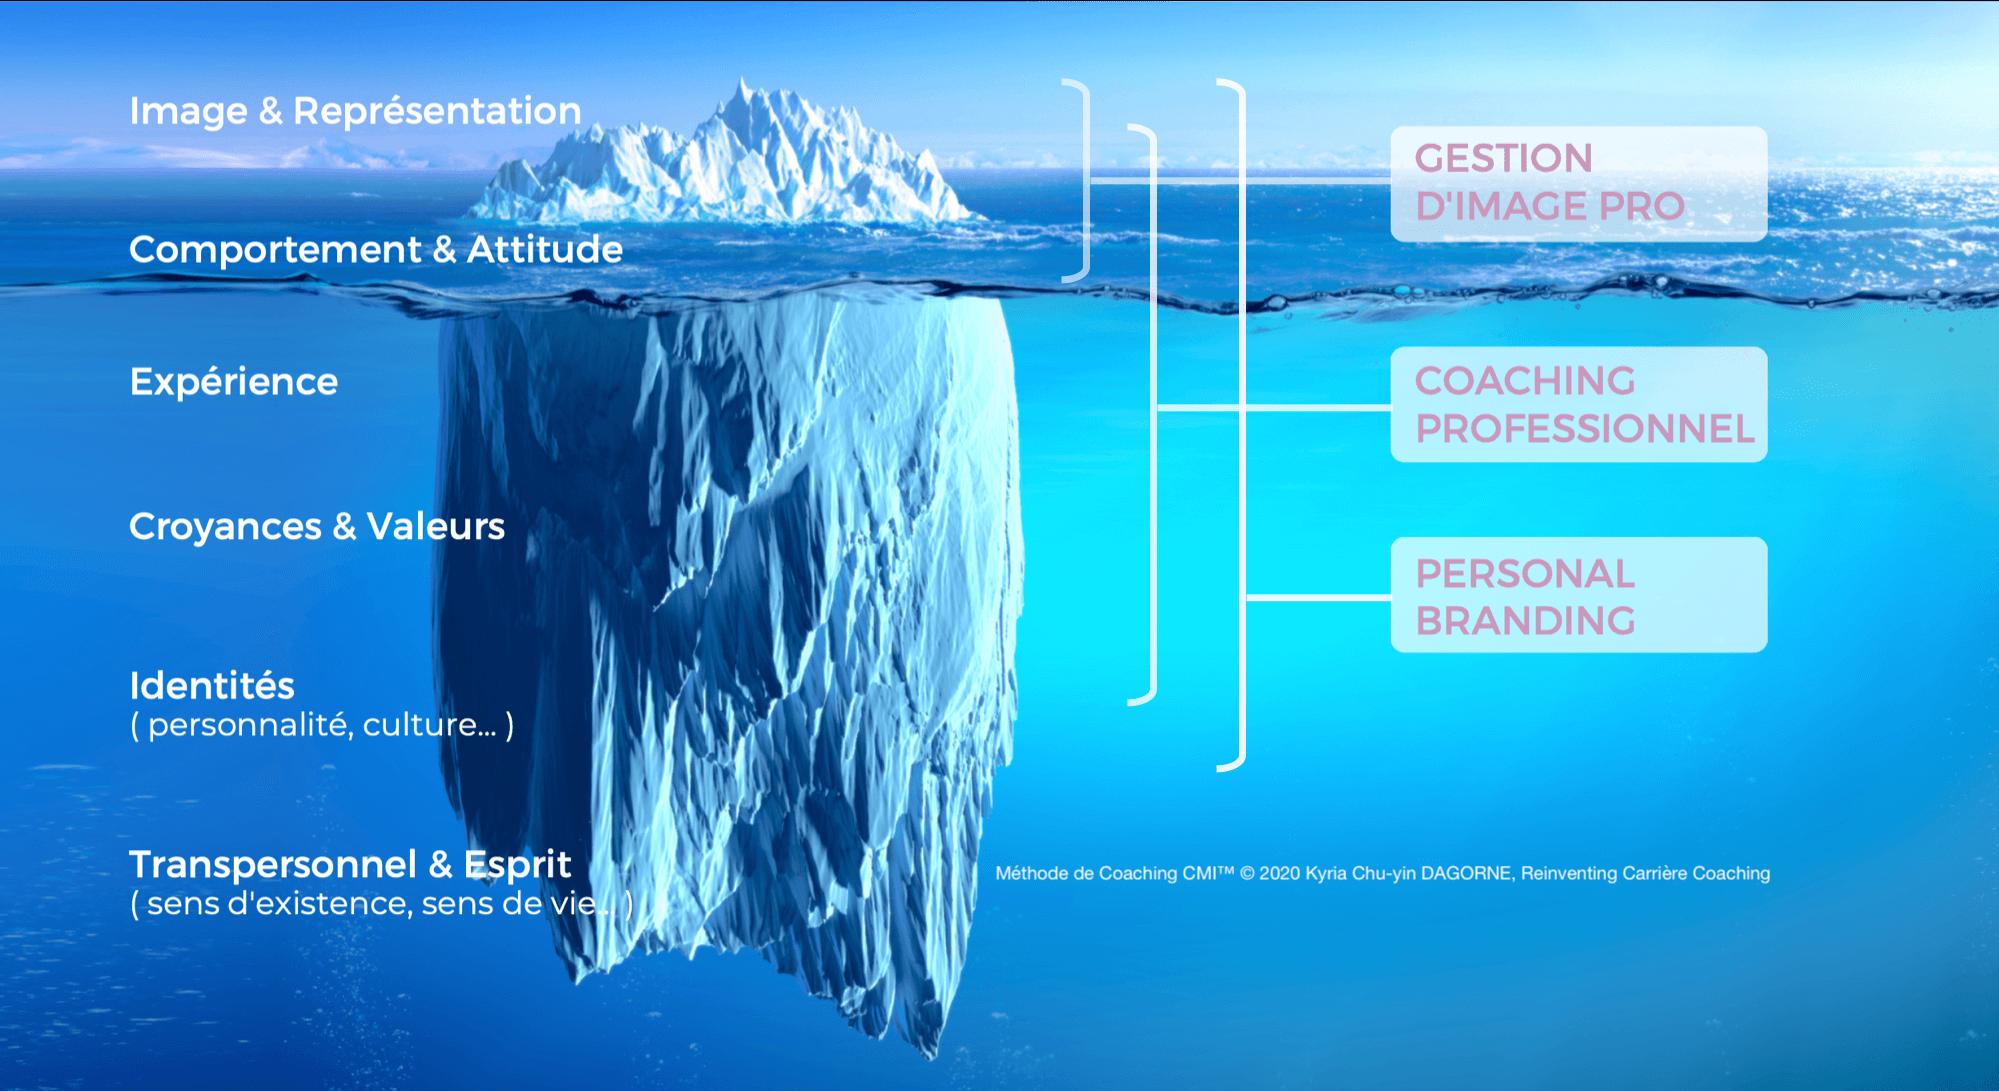 Iceberg, Méthode de Coaching CMI™ © 2020 Kyria Chu-yin DAGORNE, Reinventing Carrière Coaching - Coaching Professionnel, Personal Branding, Image Professionnelle